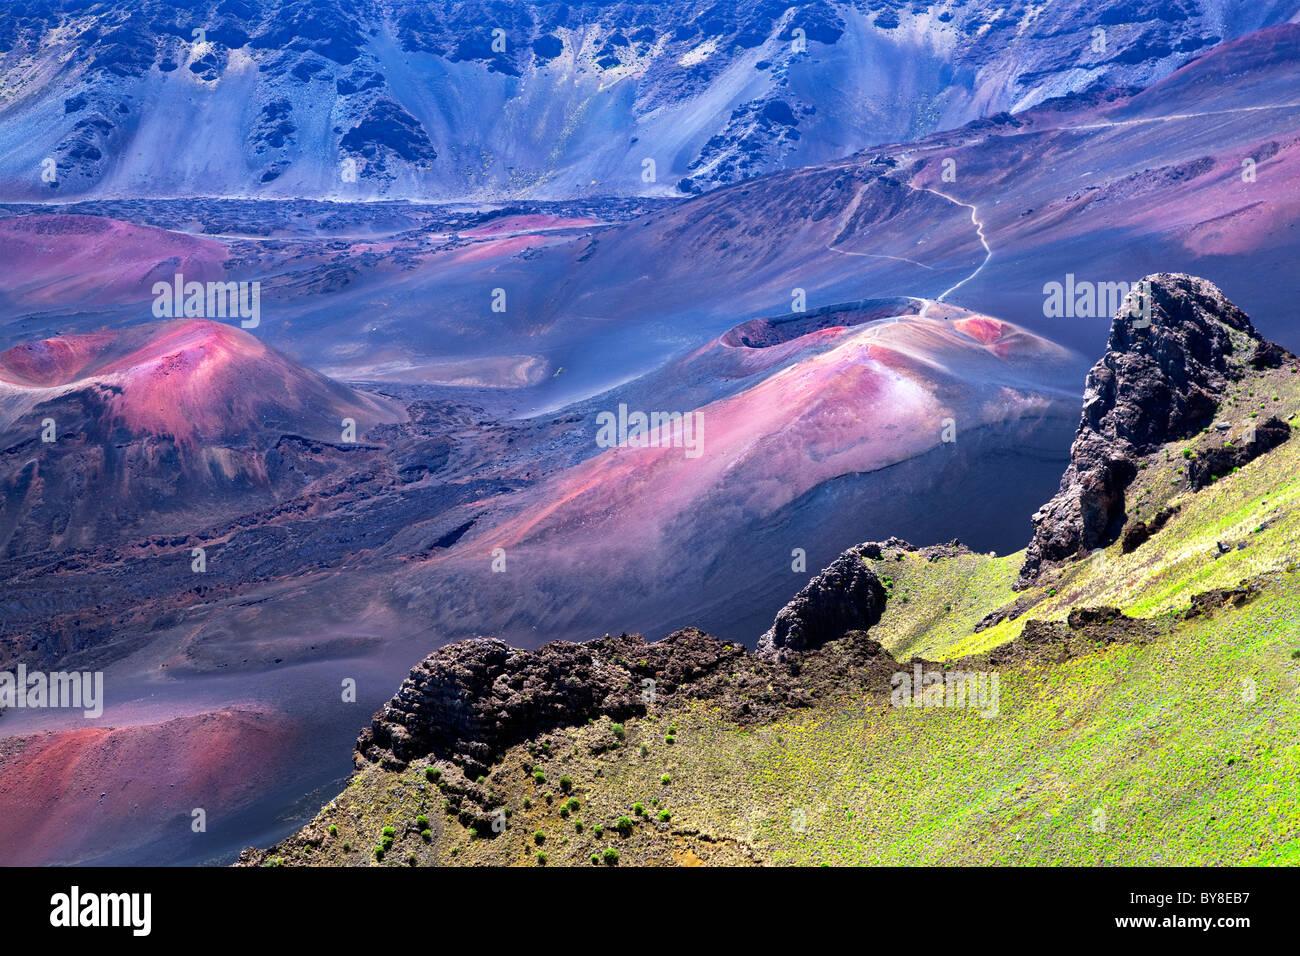 Volcanic craters. Haleakala National Park, Maui, Hawaii Stock Photo